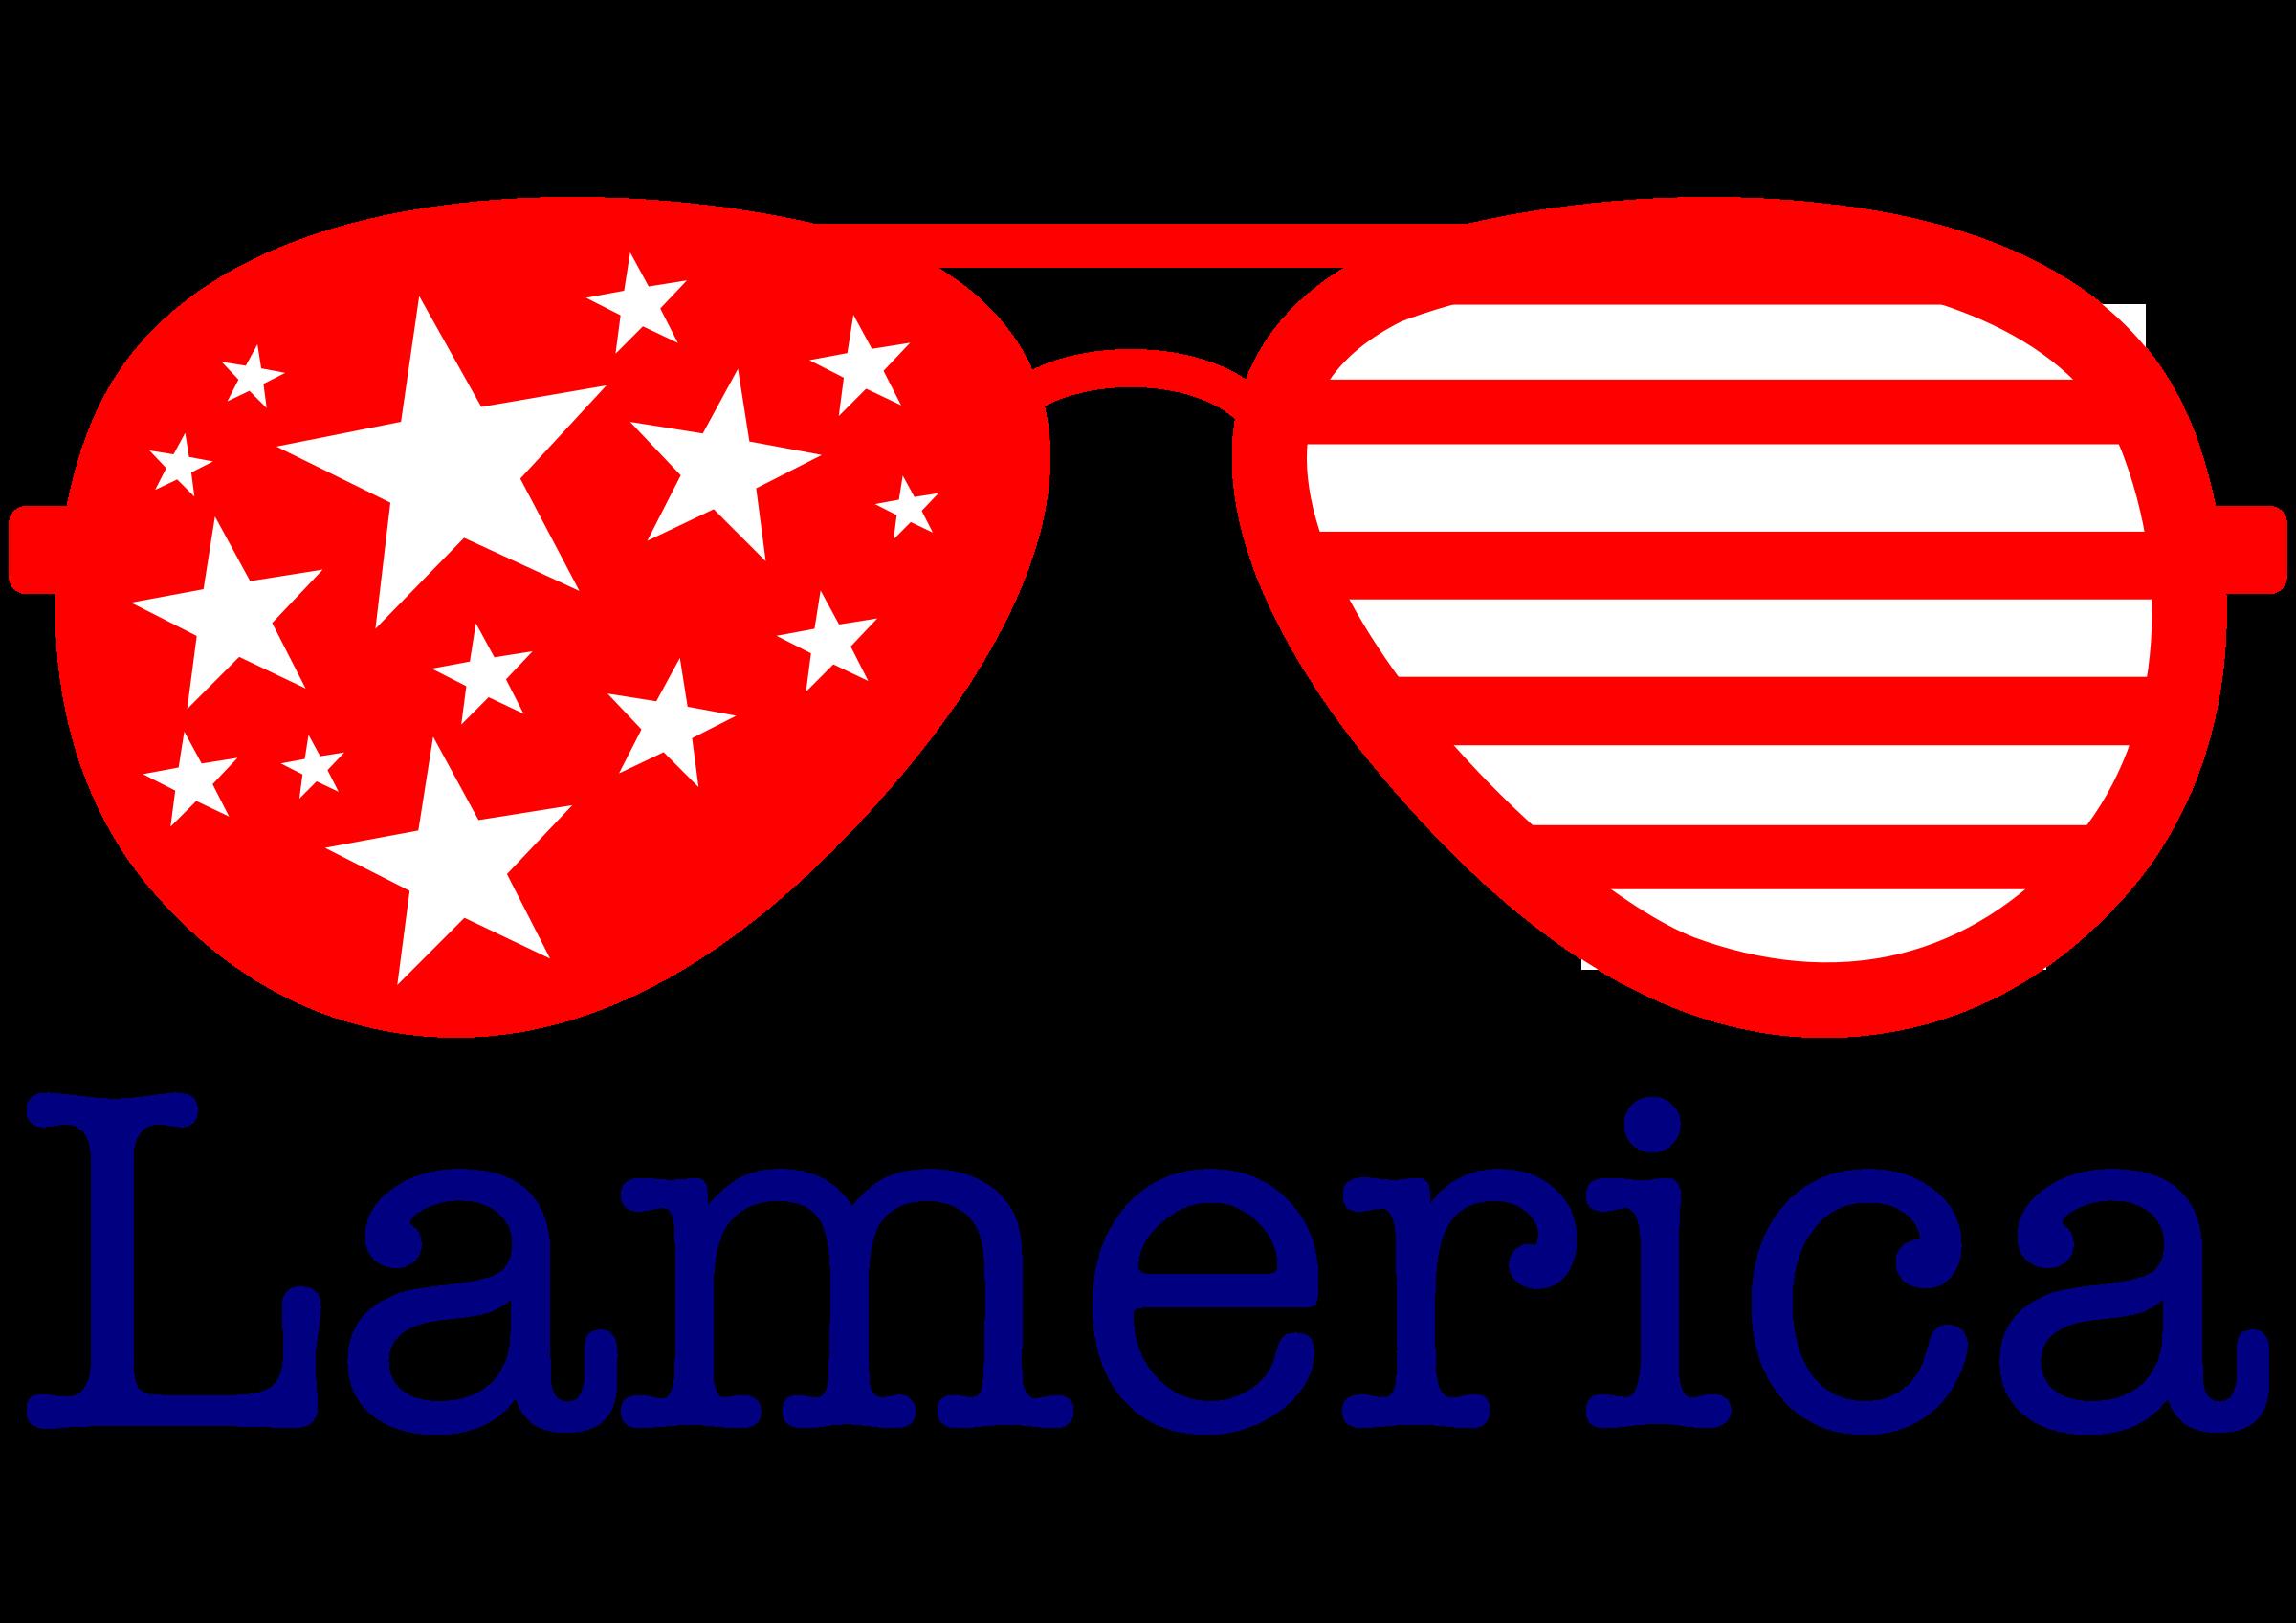 Flag clipart sunglasses. Lamerica big image png